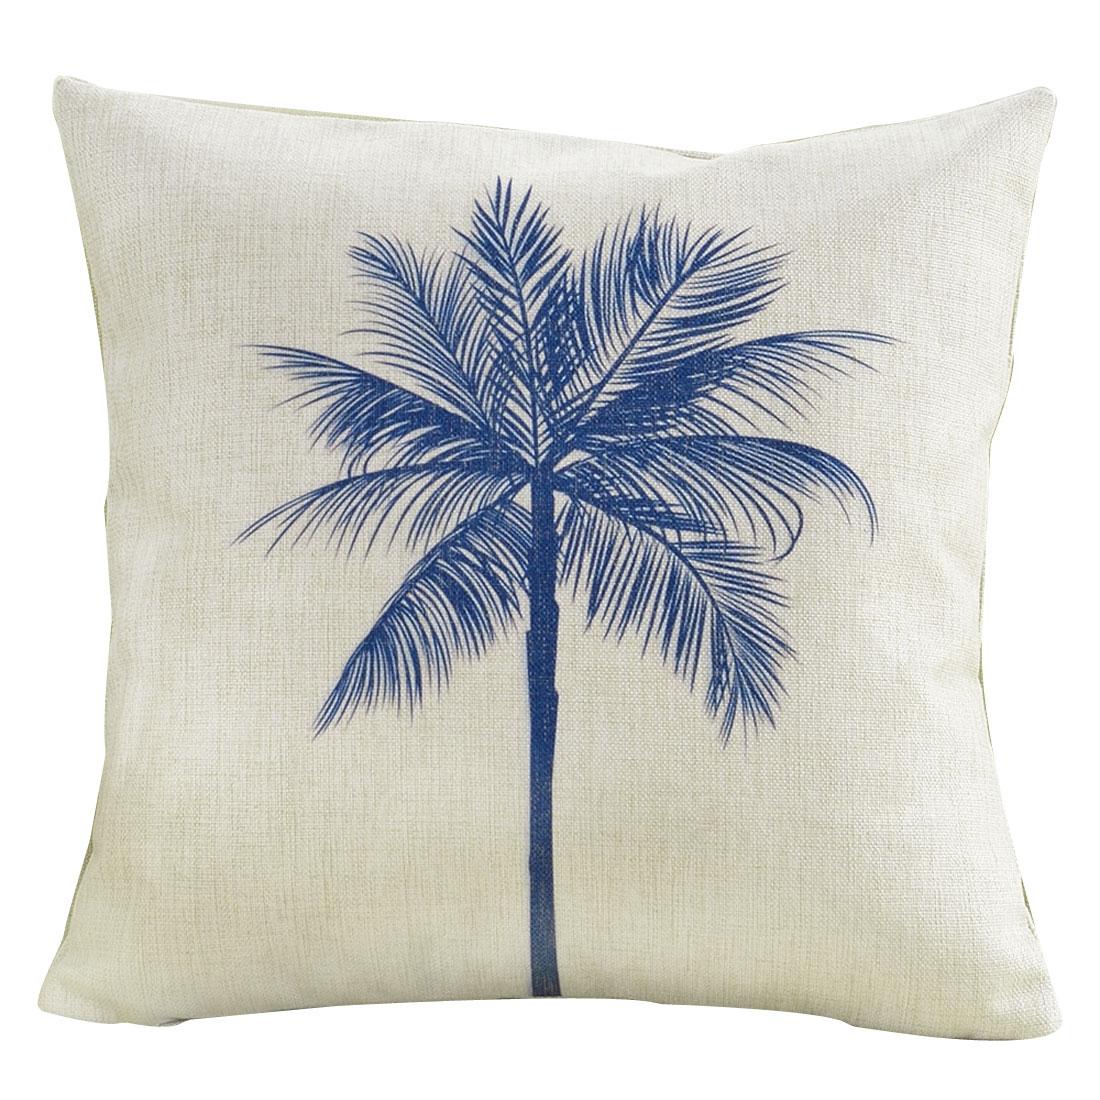 Sofa Cotton Linen Coconut Palm Pattern Square Design Waist Throw Cushion Pillow Cover